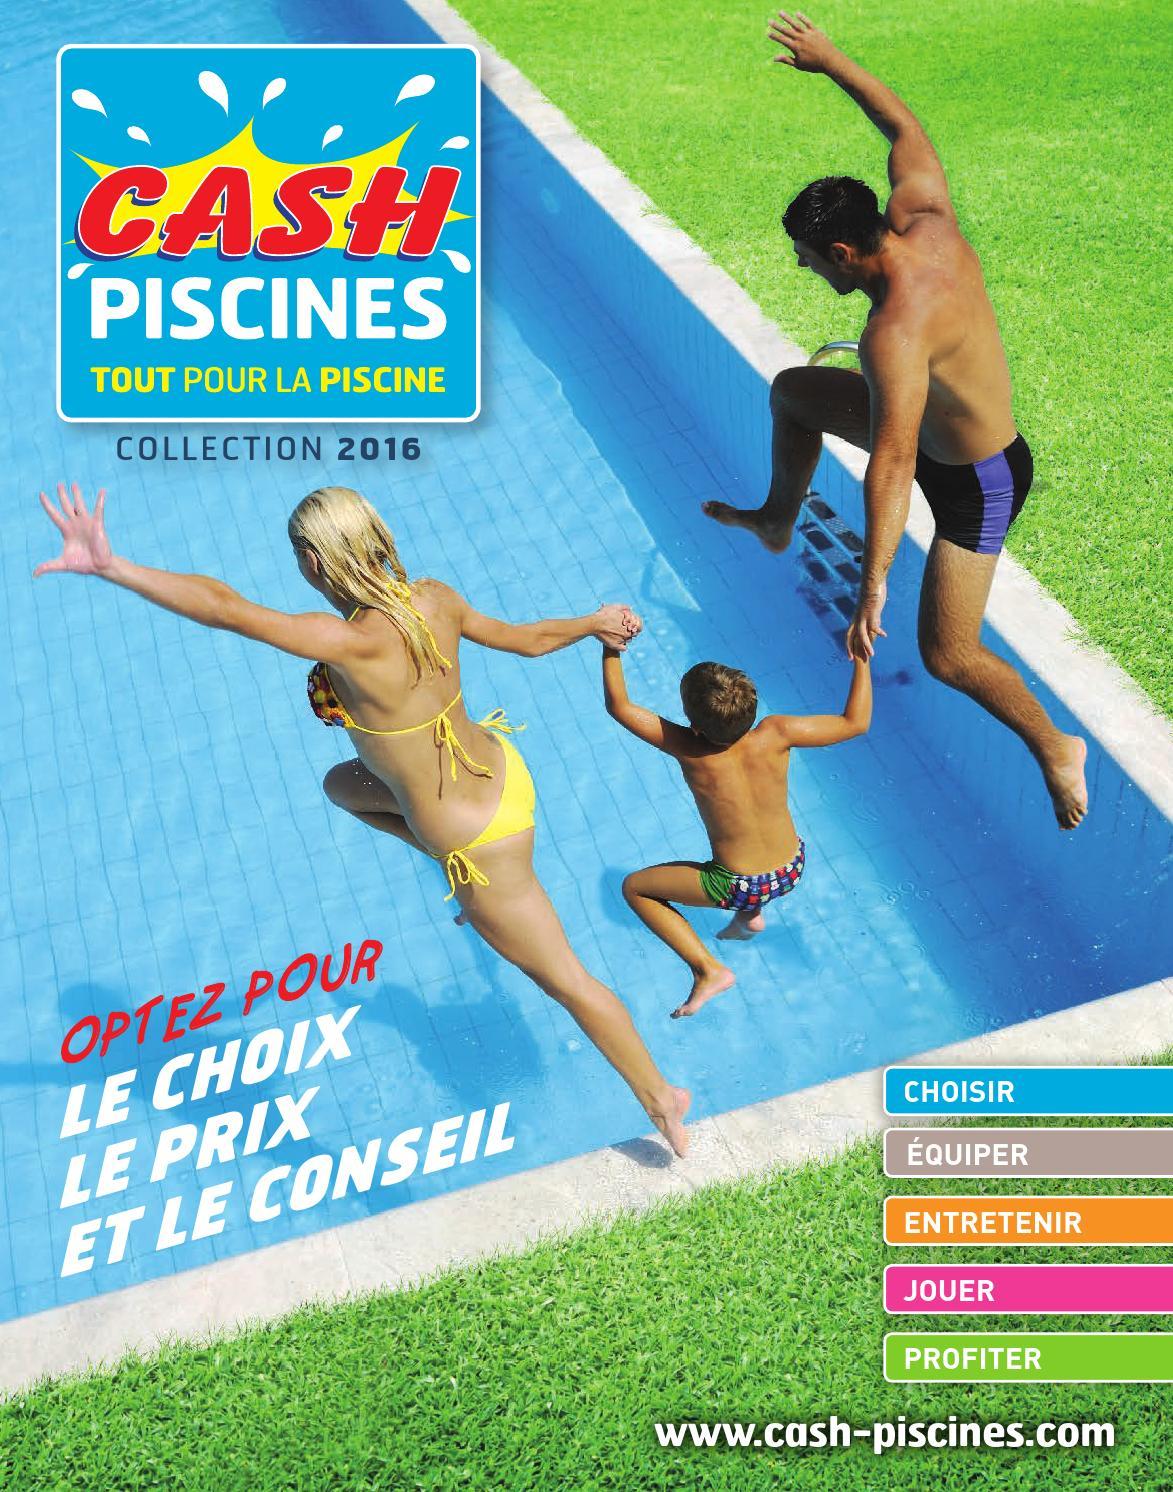 Cash Piscines 2016 By Octave Octave - Issuu avec Cash Piscine Beziers